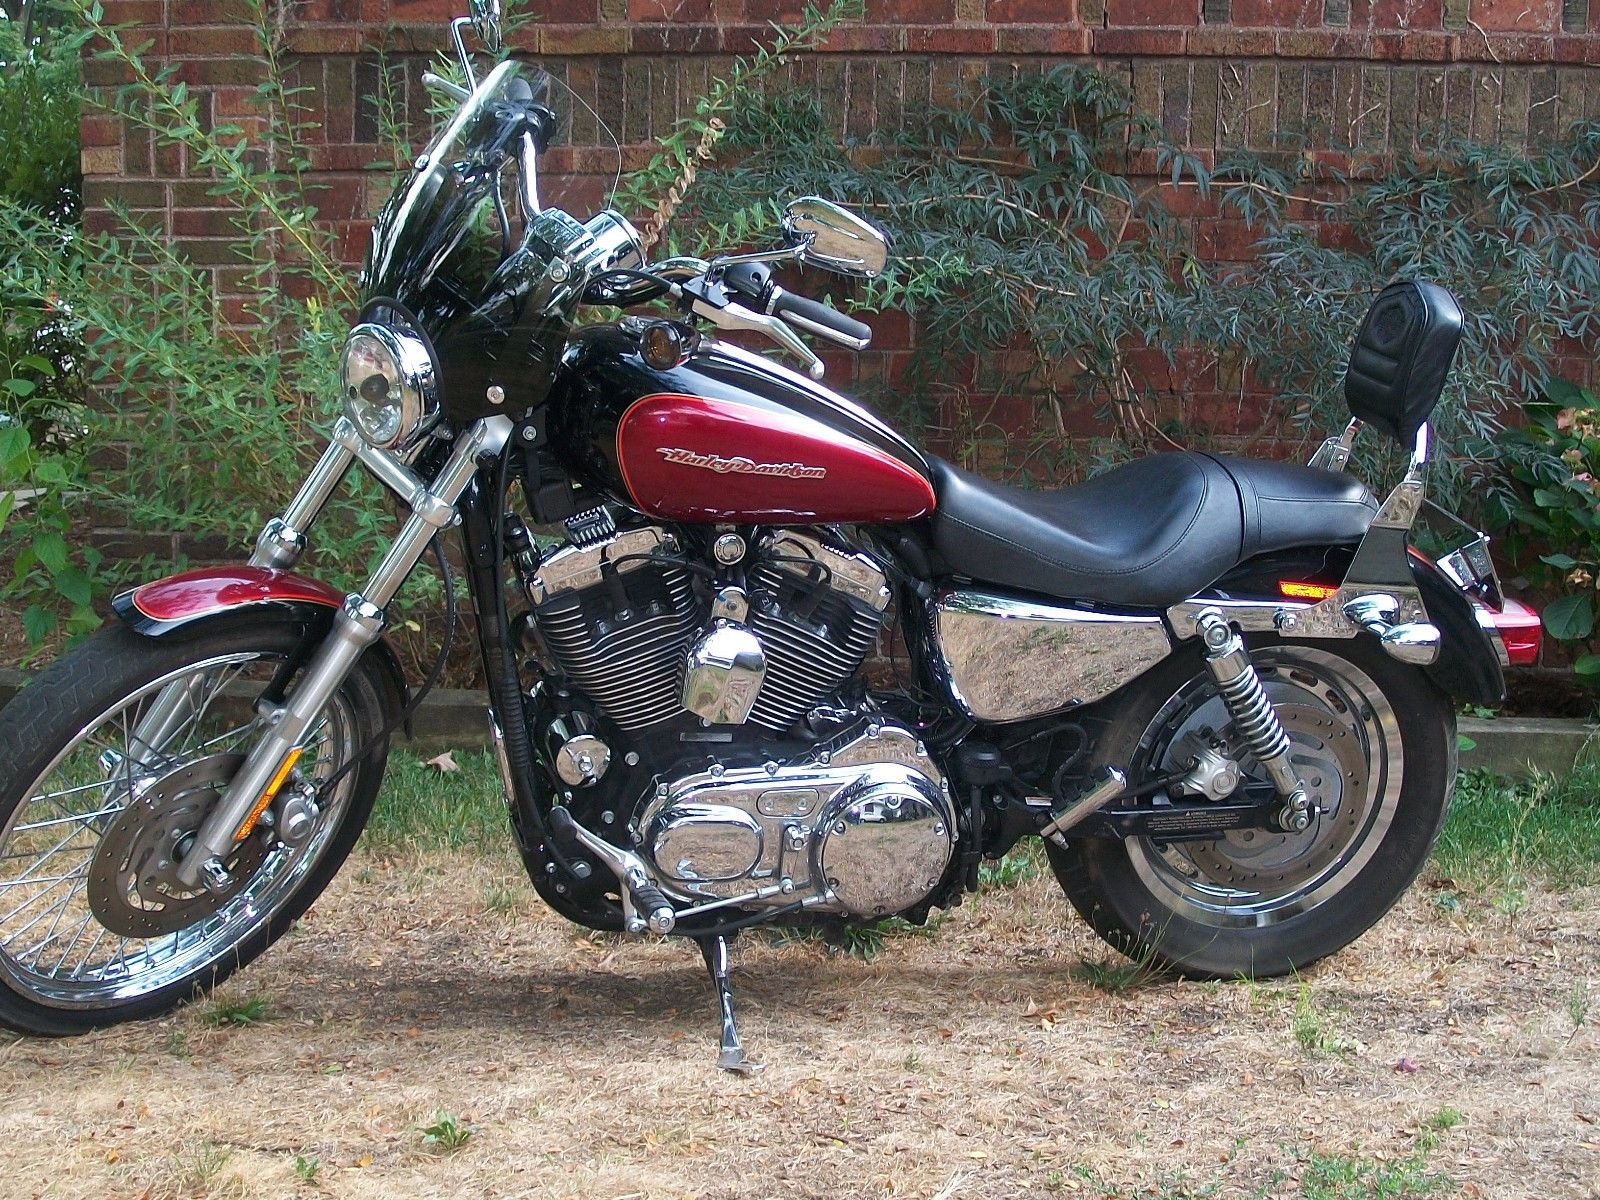 ebay: 2005 harley-davidson sportster 2005 sportster 1200 custom